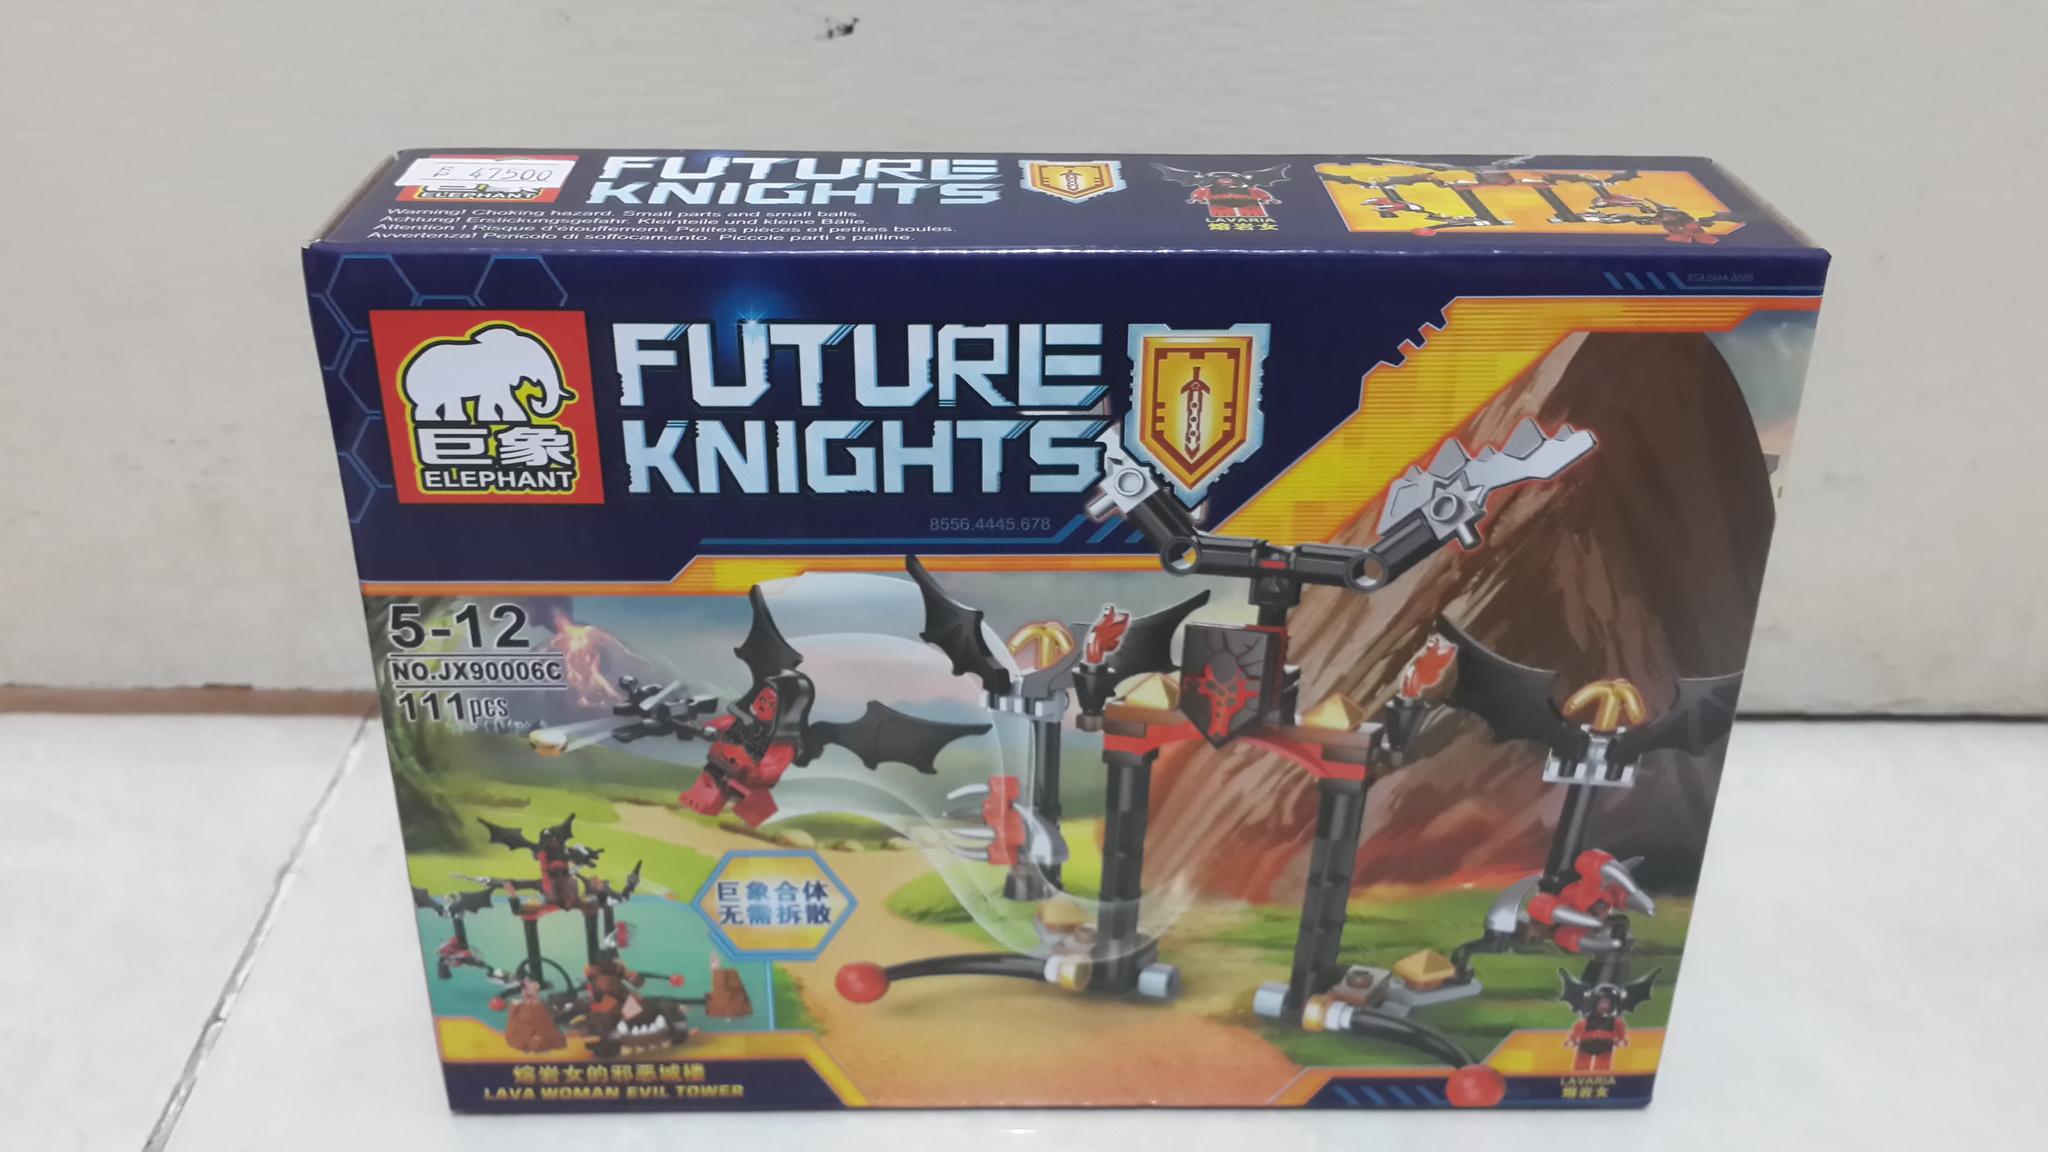 Jual Lego Future Knights Okage Toys Tokopedia